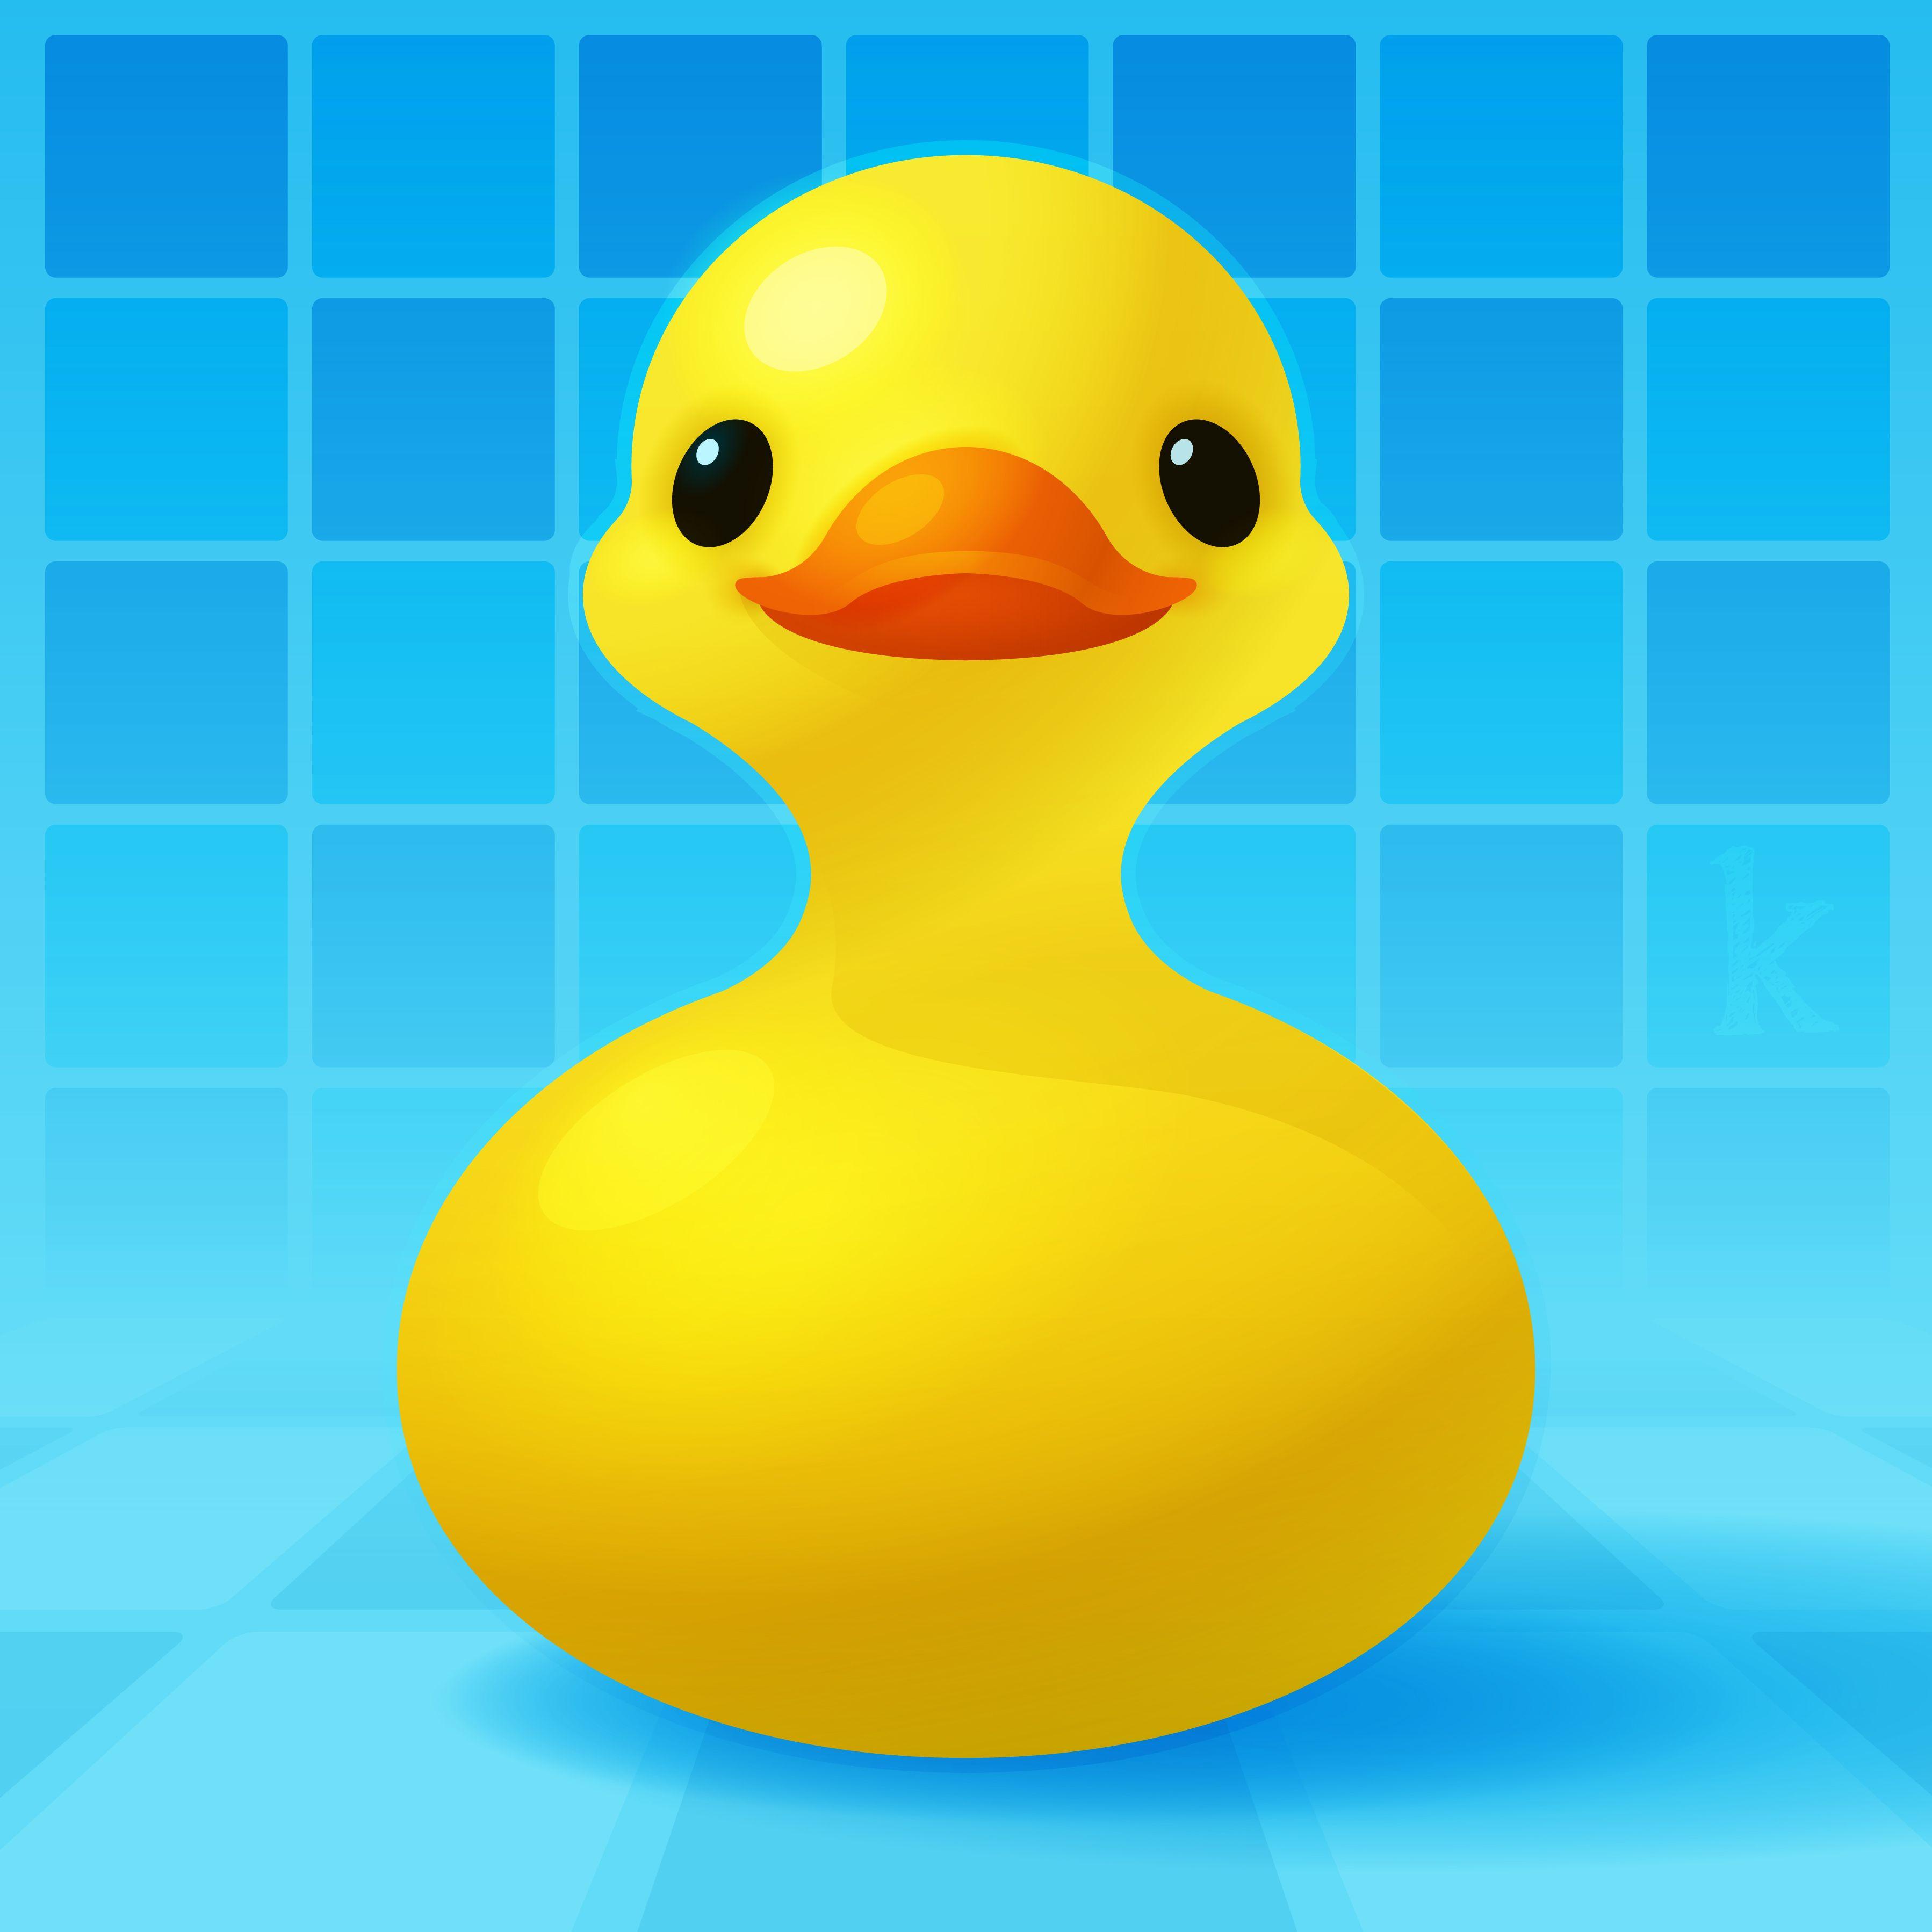 Rubber Ducky Karianne Hutchinson Illustration Vector Illustrator art ...